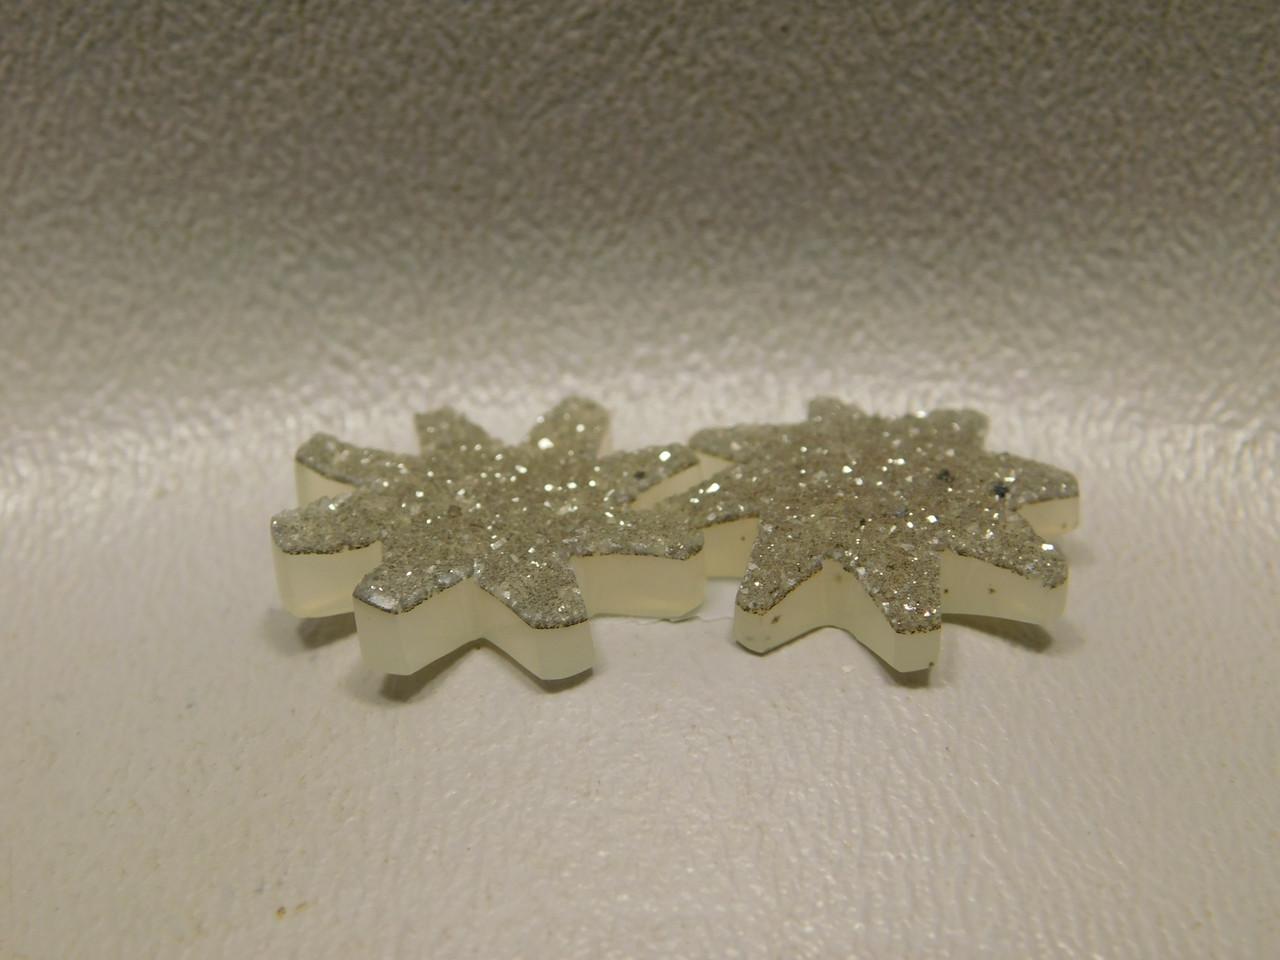 Druse Agate Drusy Crystal Designer Cabochon Star Shaped #5